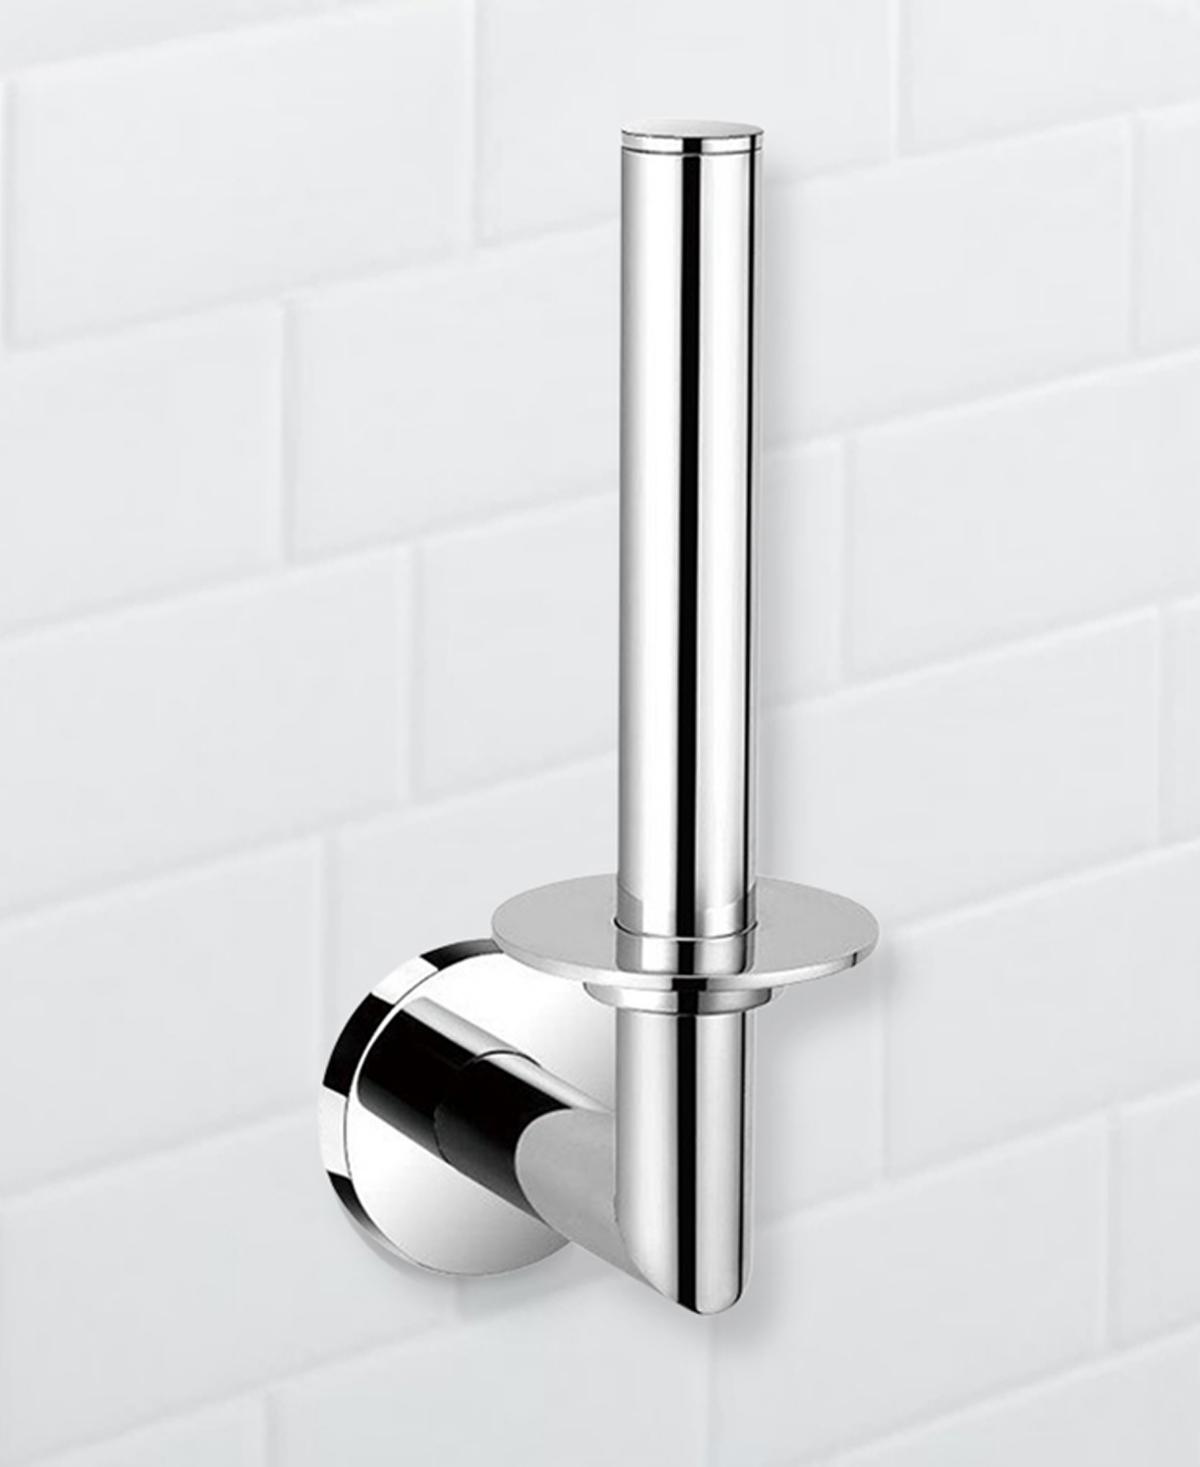 Nameeks General Hotel Round Chrome Vertical Toilet Paper Holder Bedding